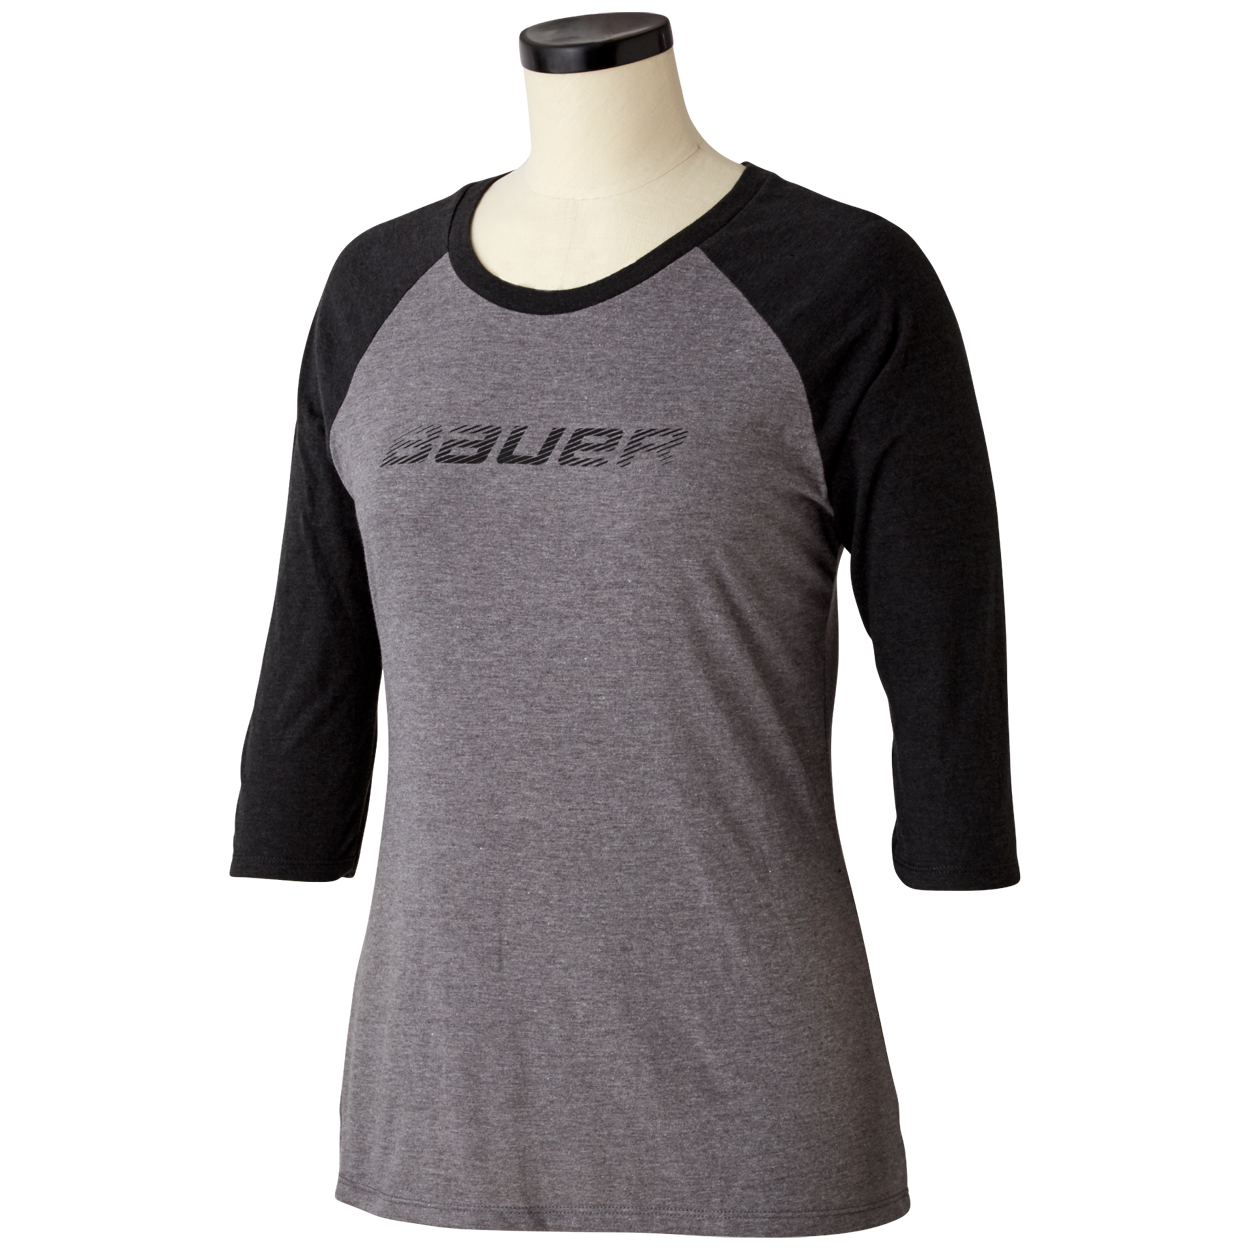 Lifestyle Hockey Apparel Shop Hockey Shirts Hoodies Bottoms